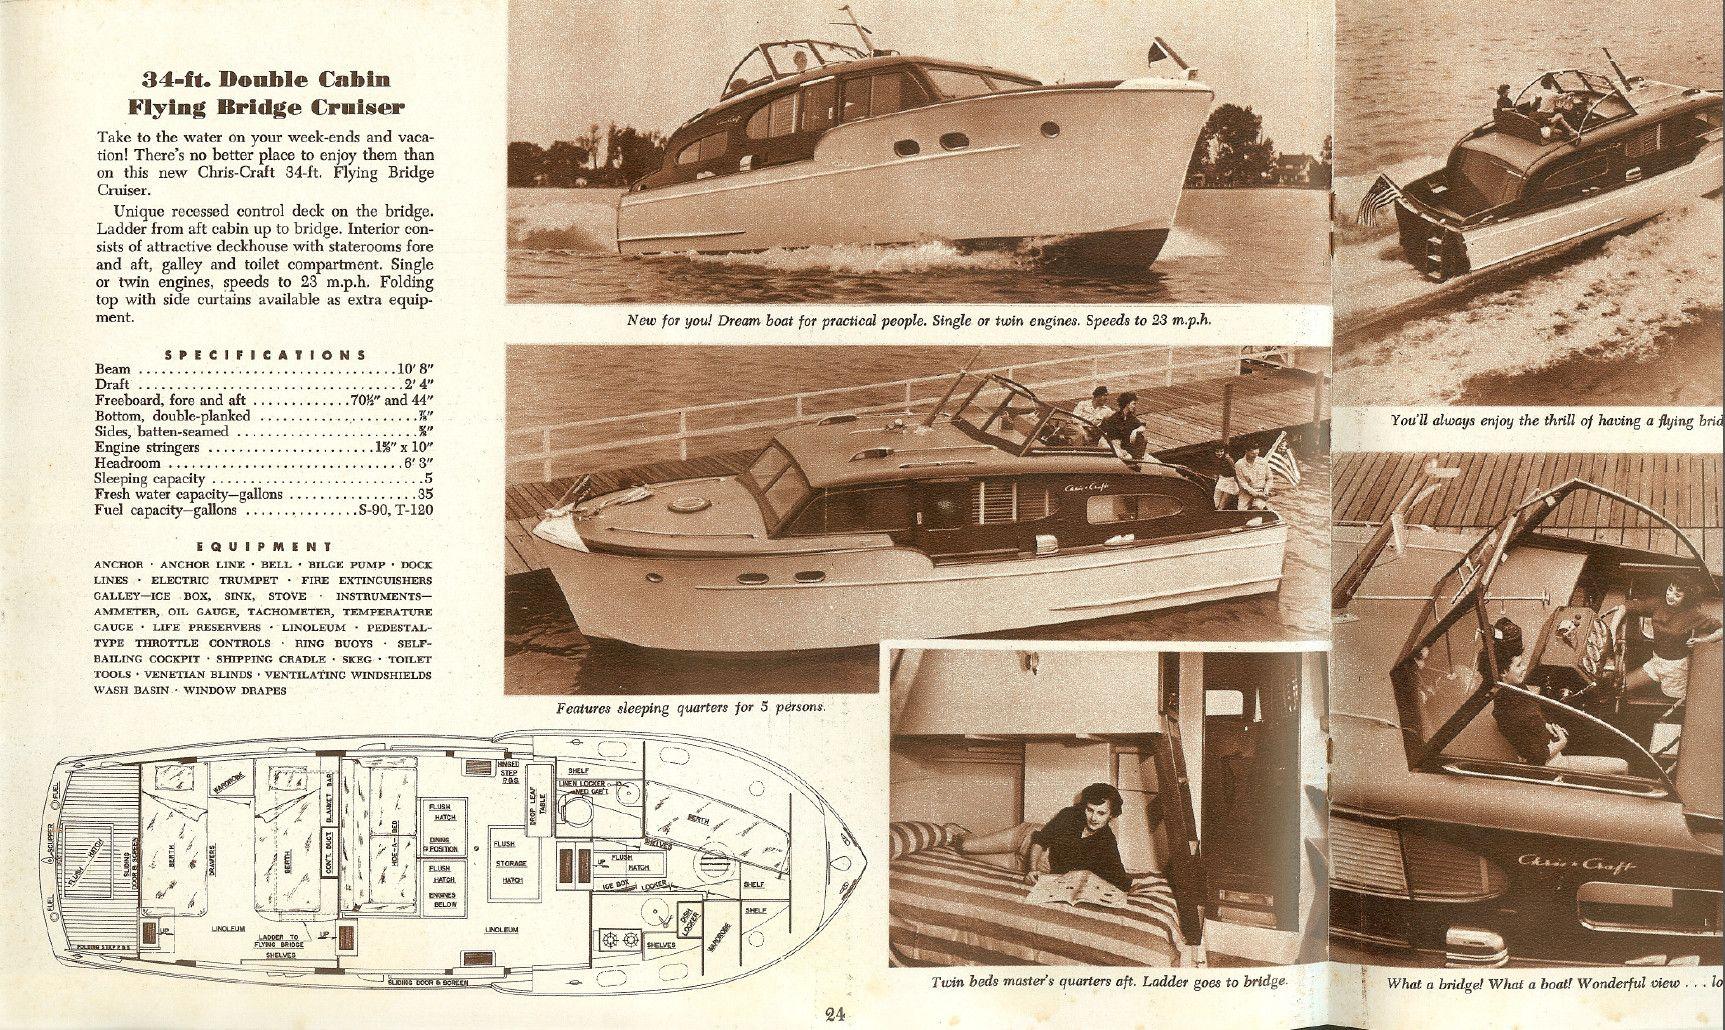 1952 Chris Craft DCFB Cruiser specs and cloorplan